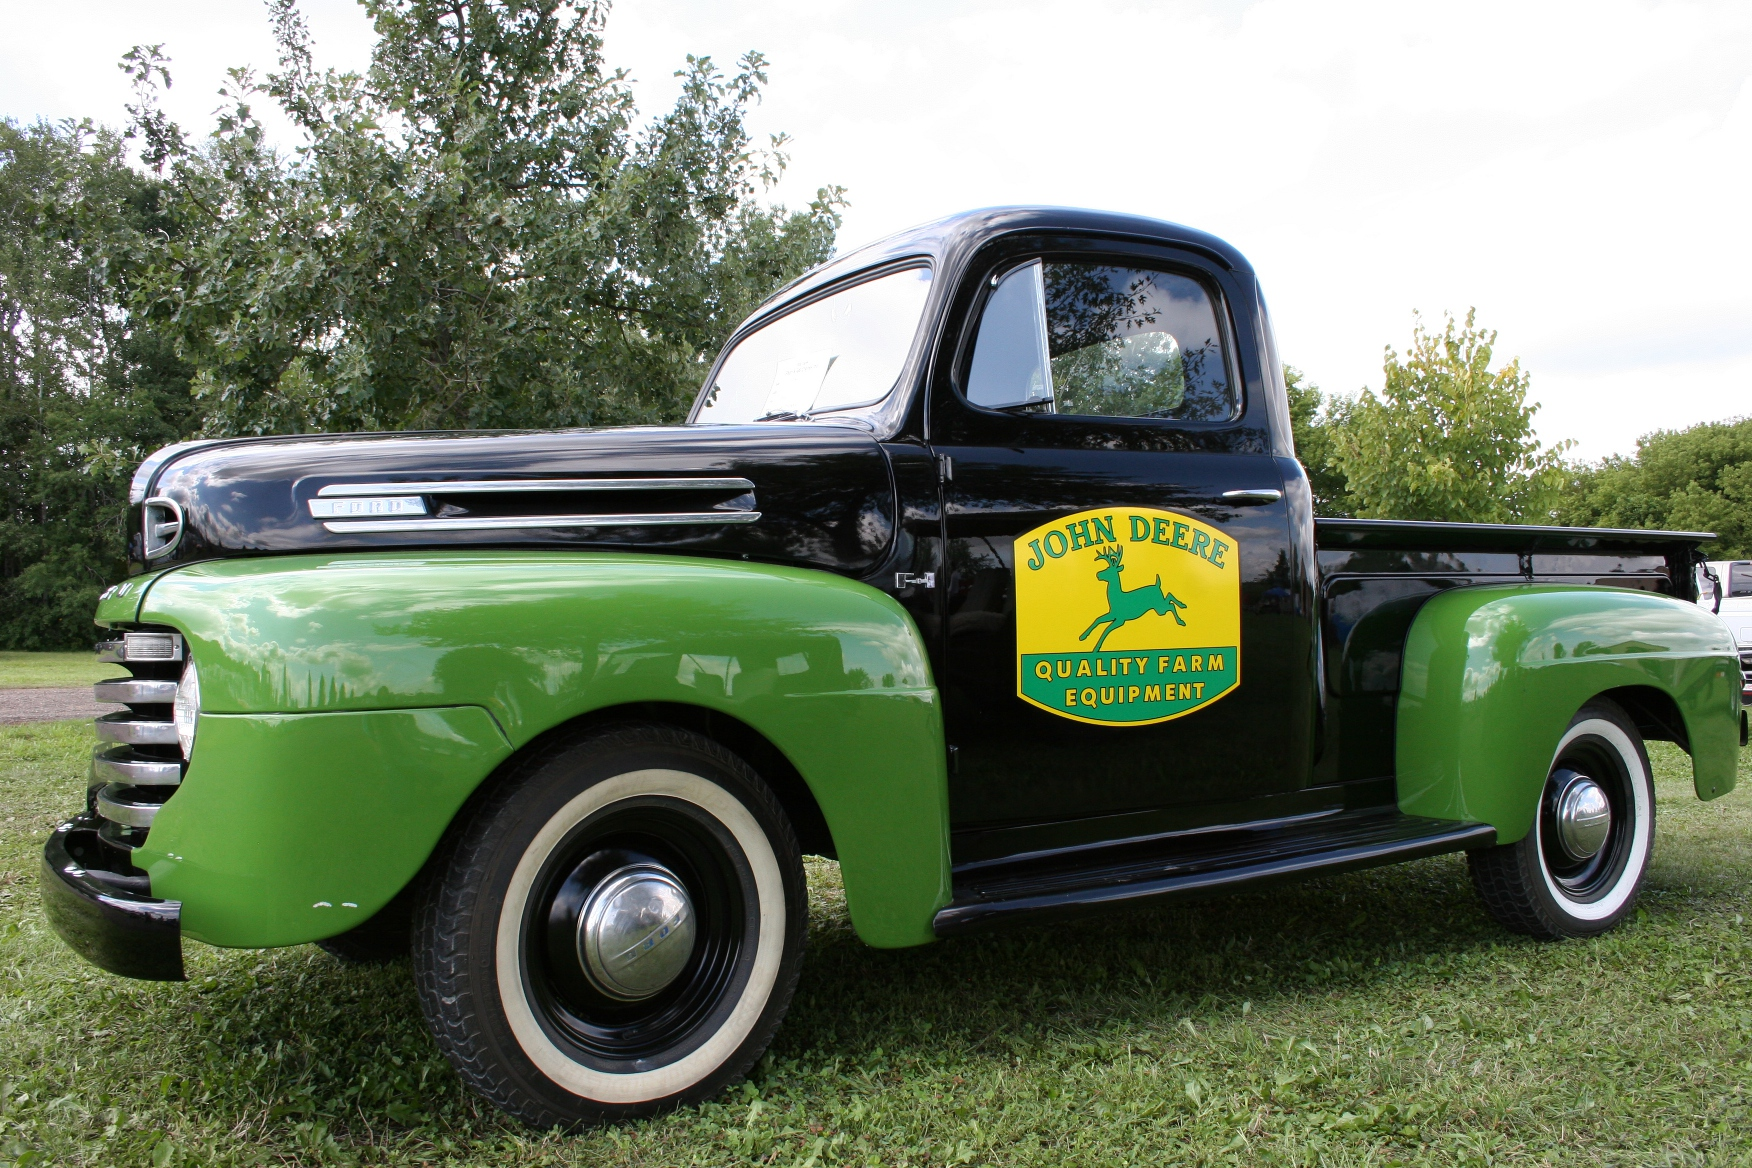 John Deere Girls : Rice county steam gas engines show minnesota prairie roots